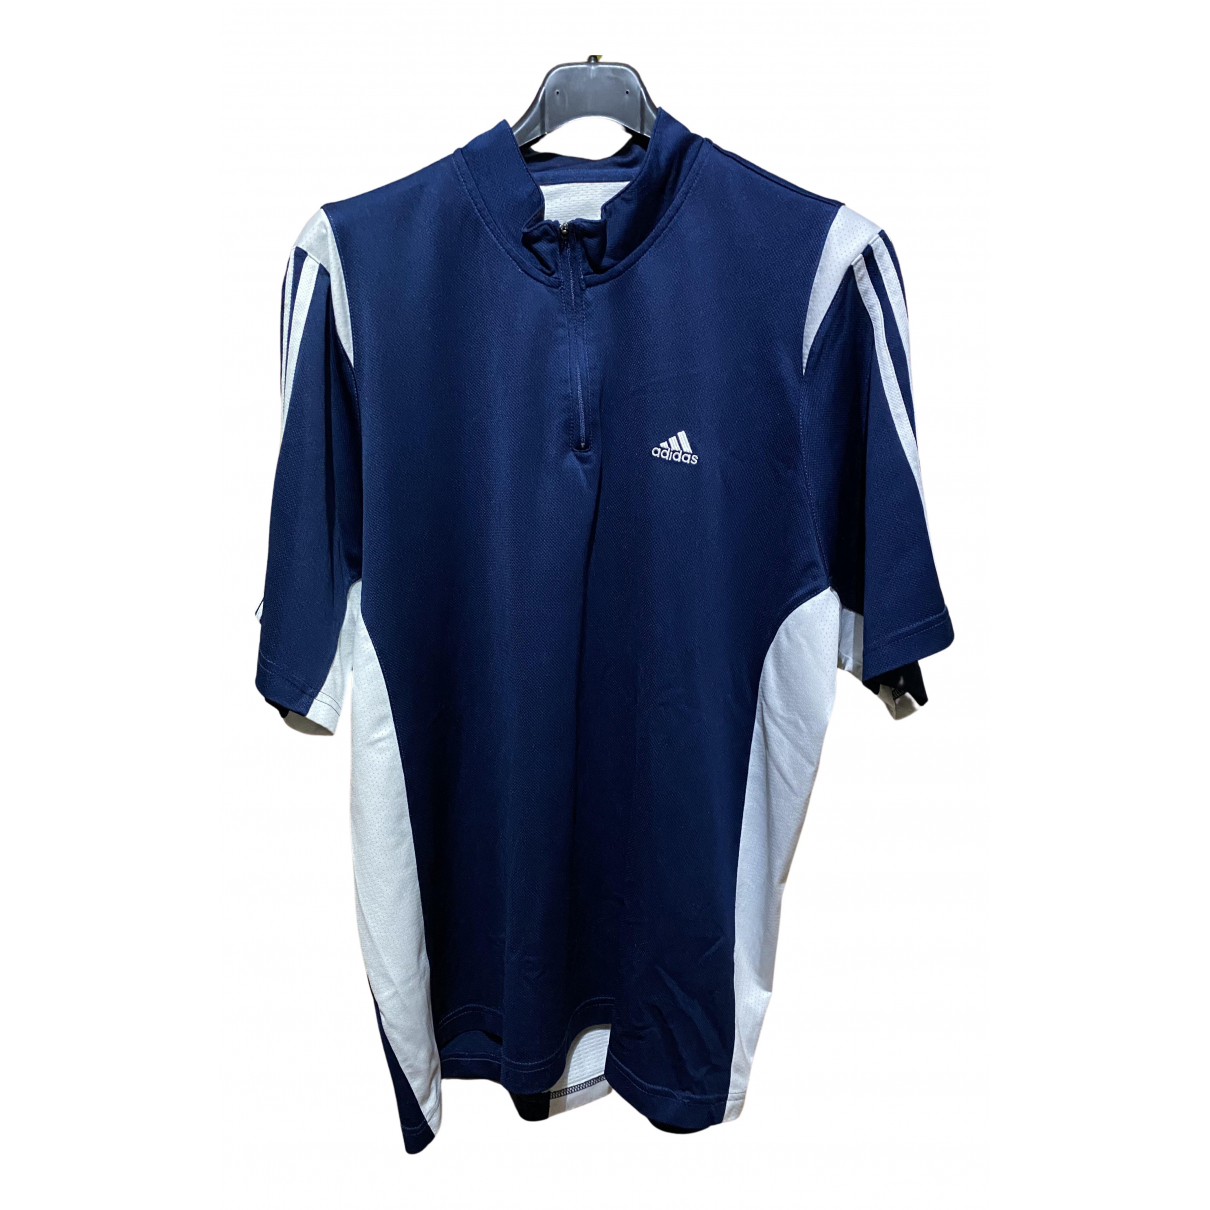 Adidas - Tee shirts   pour homme - bleu